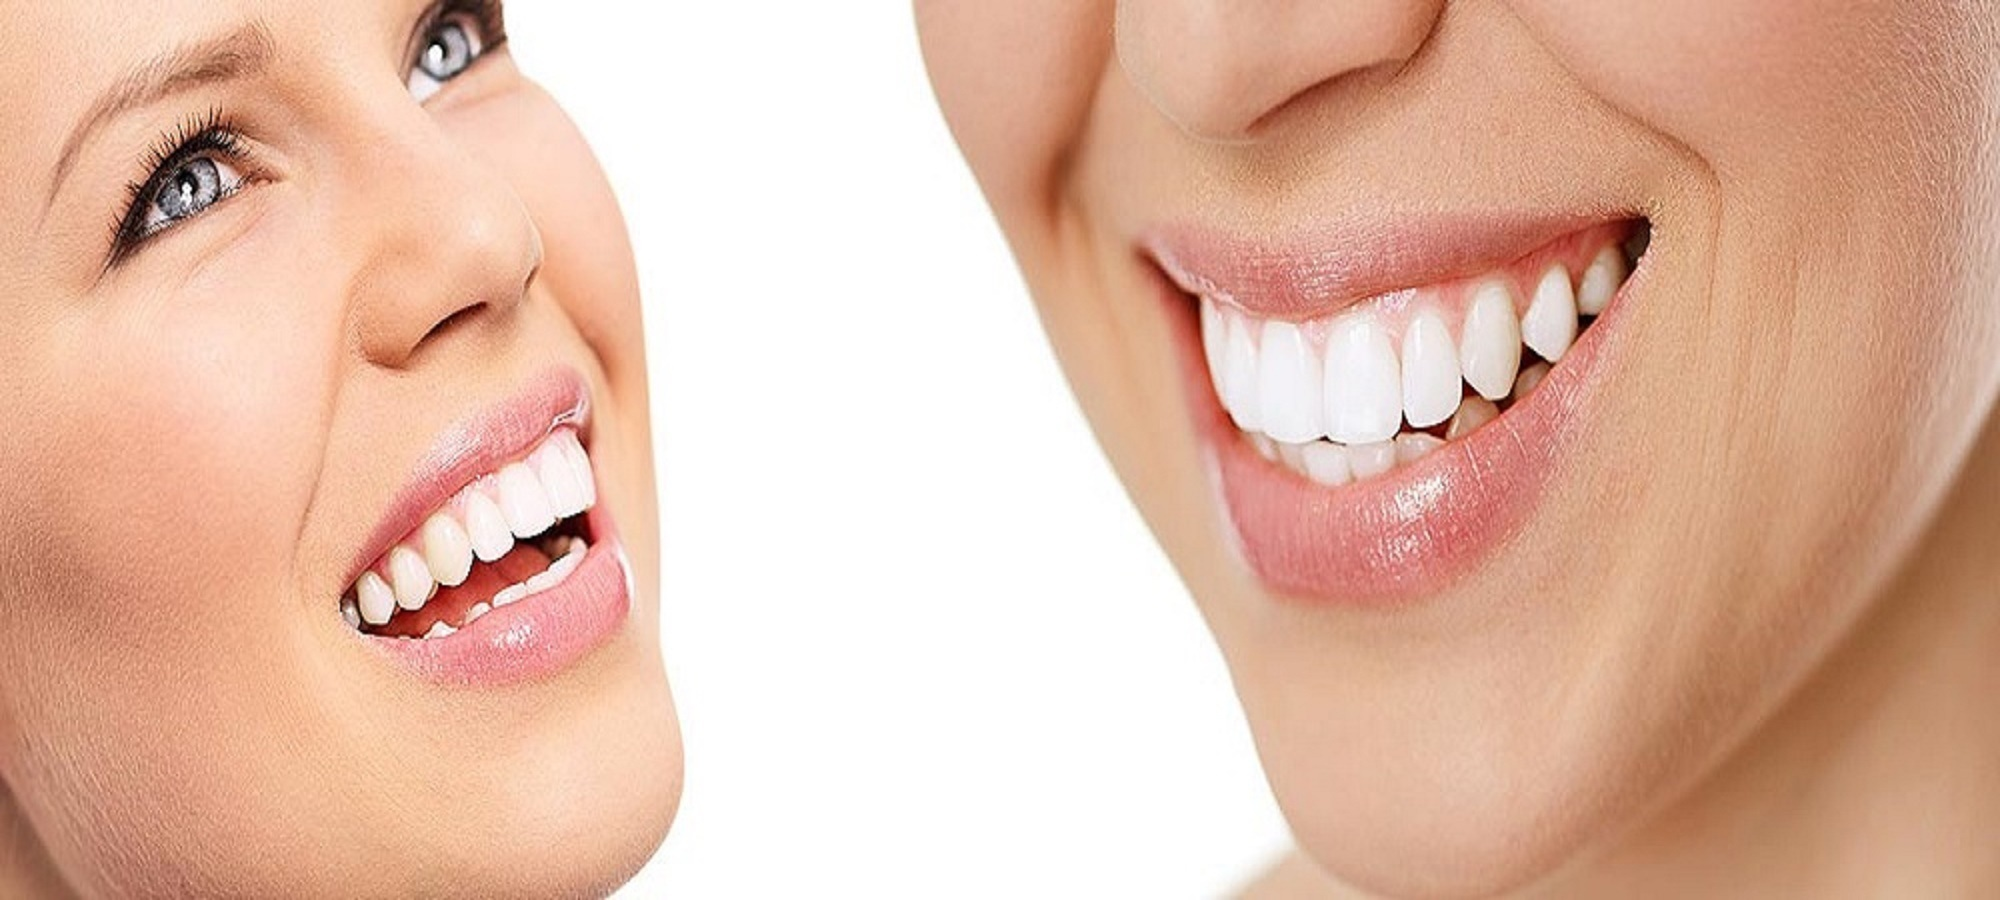 smiling teeth county 2496107